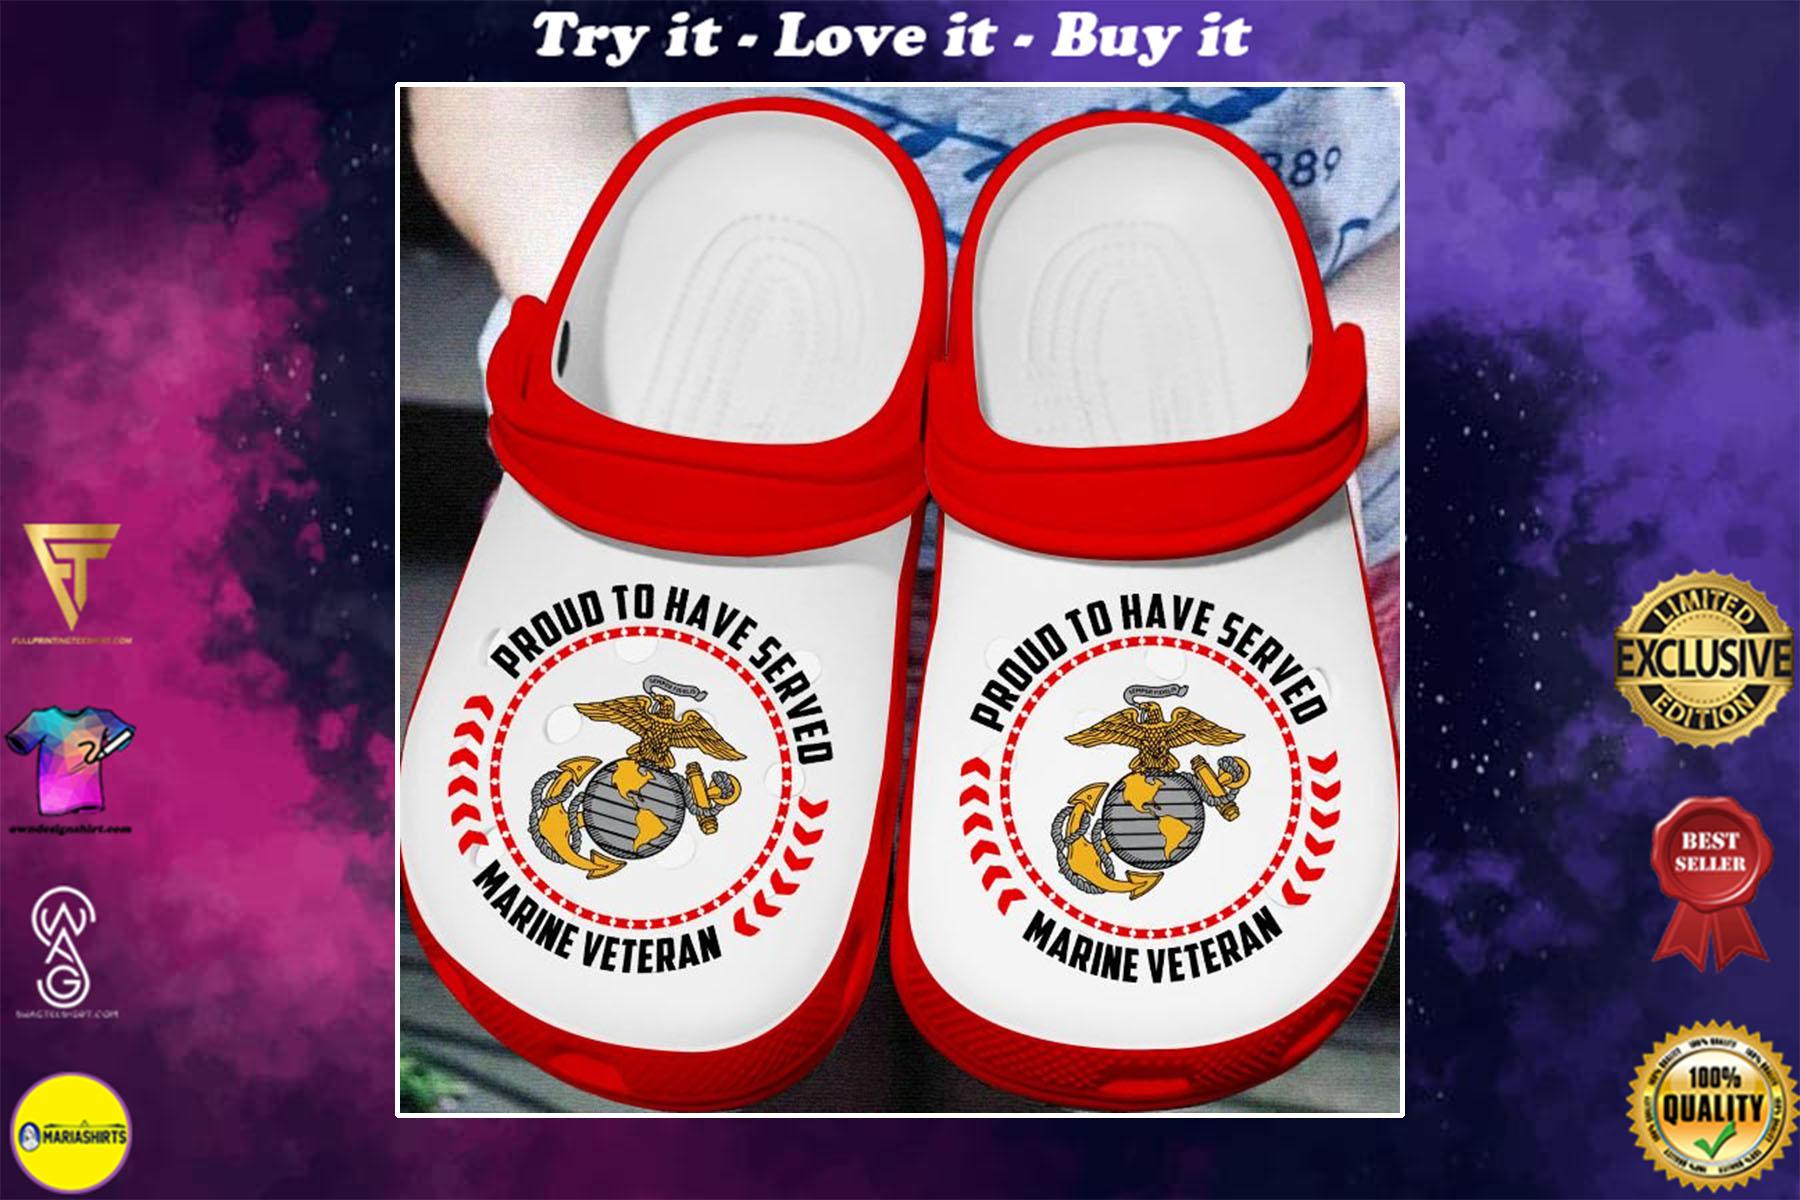 proud to have served marine veteran crocband clog